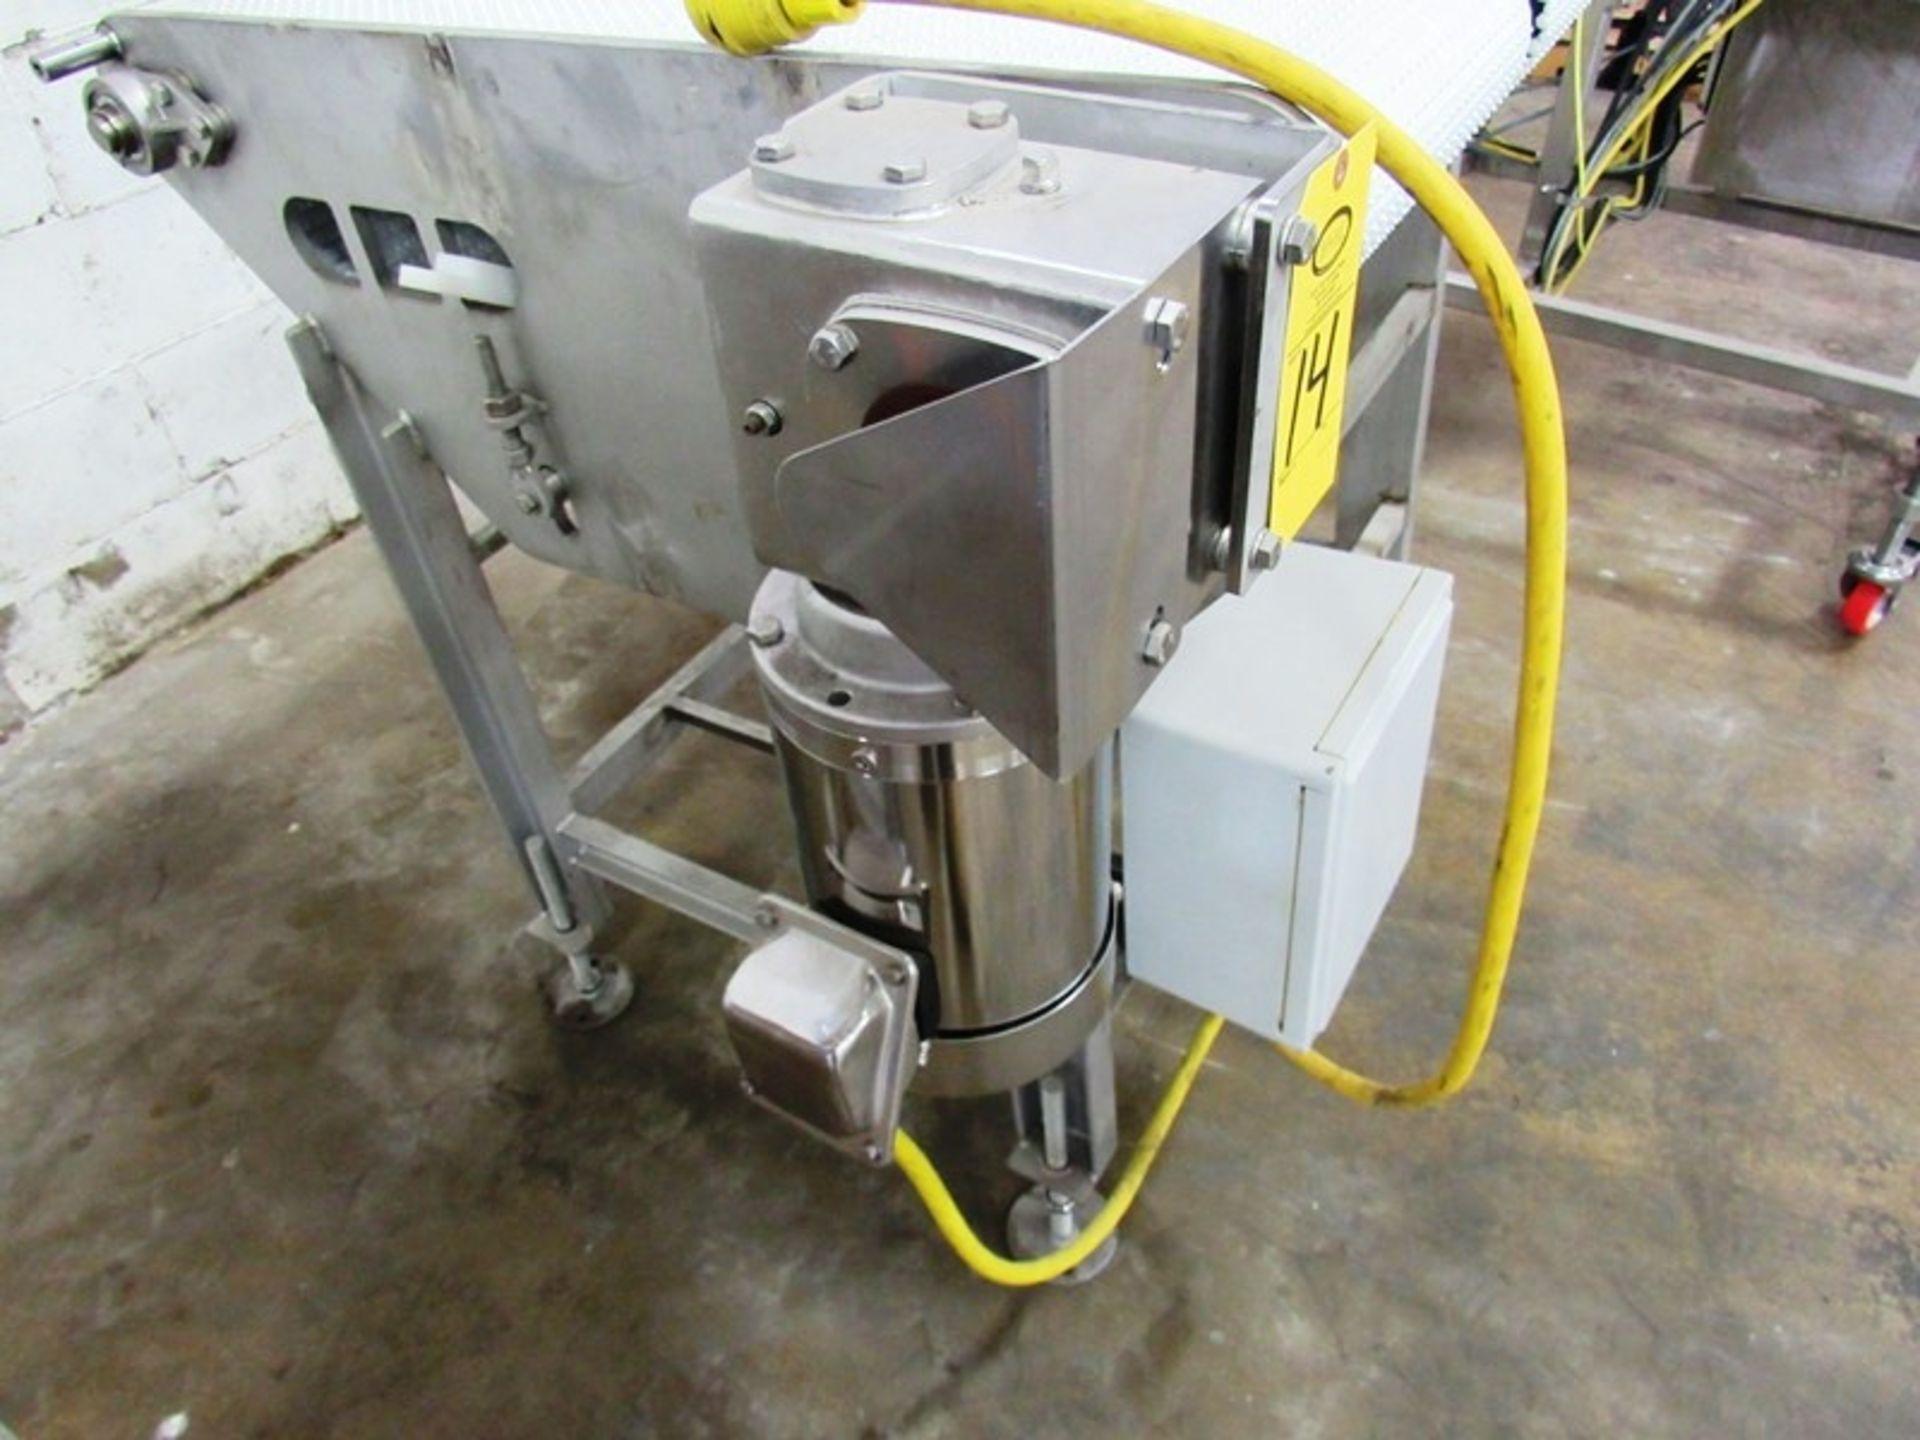 "ICF Stainless Steel Double Belt Conveyor, each belt 12"" W X 36"" L, 1 h.p., stainless steel motor, - Image 3 of 3"